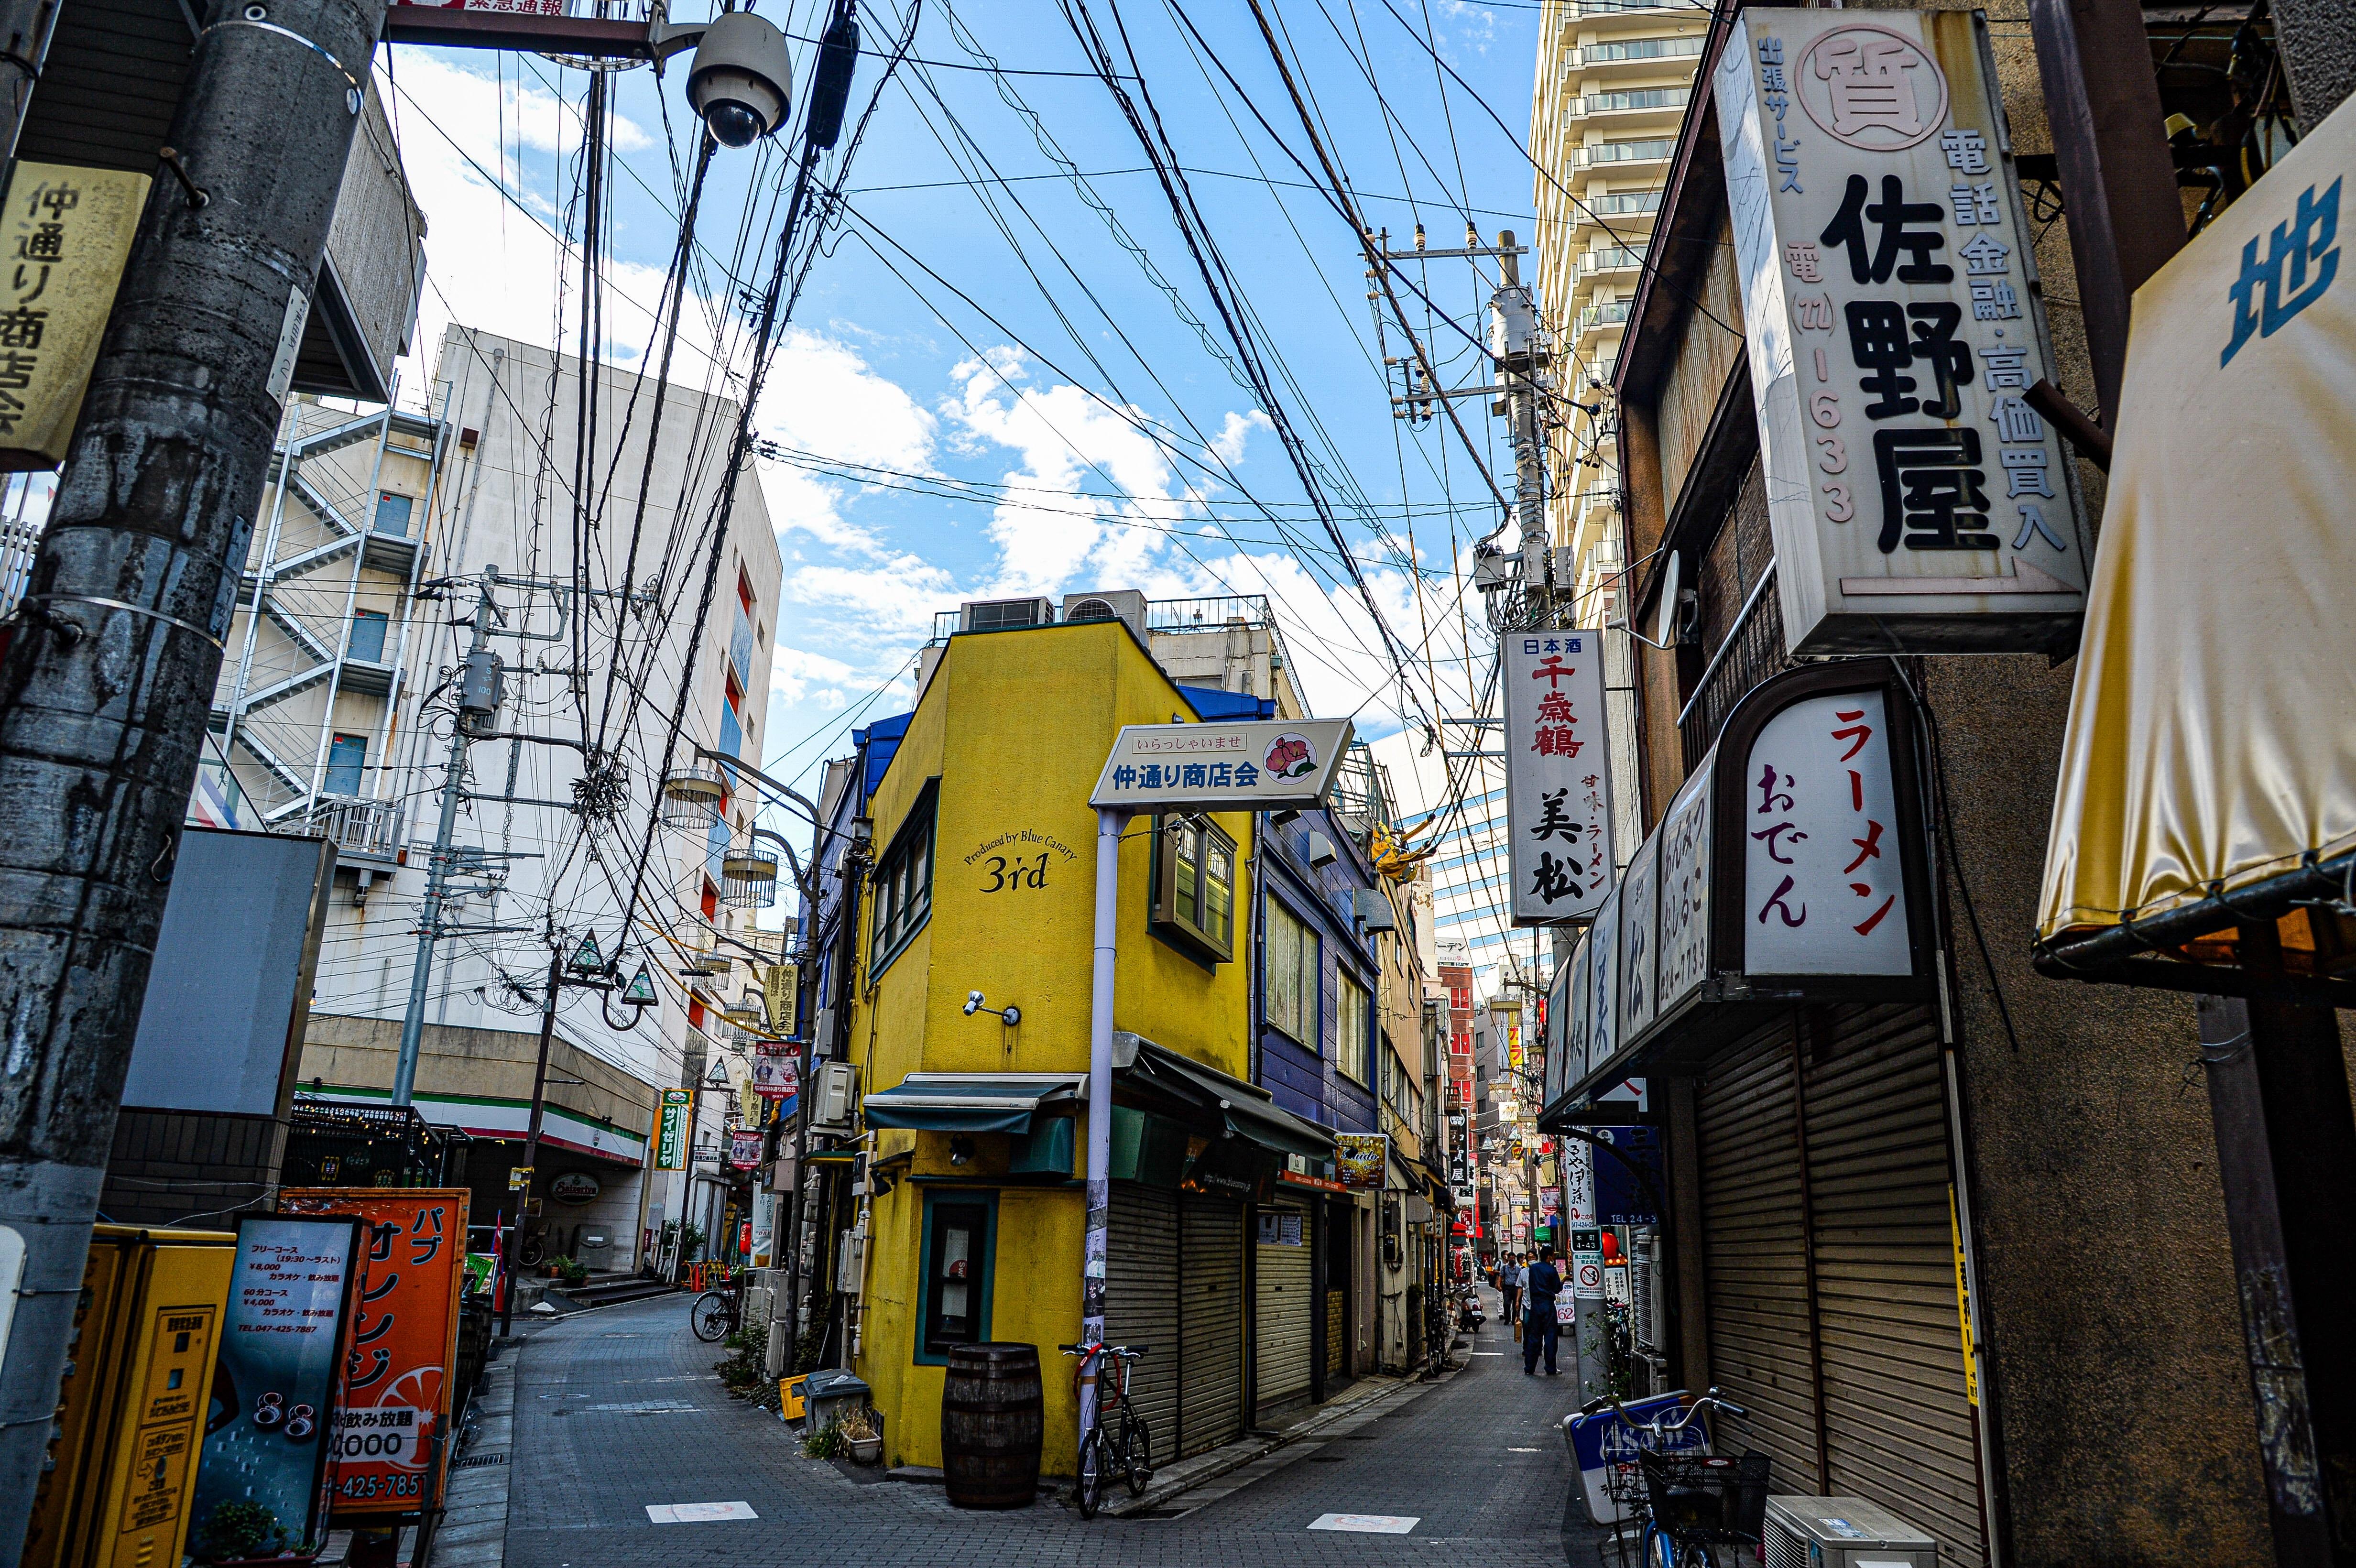 f:id:muramasachang:20210325063203j:image